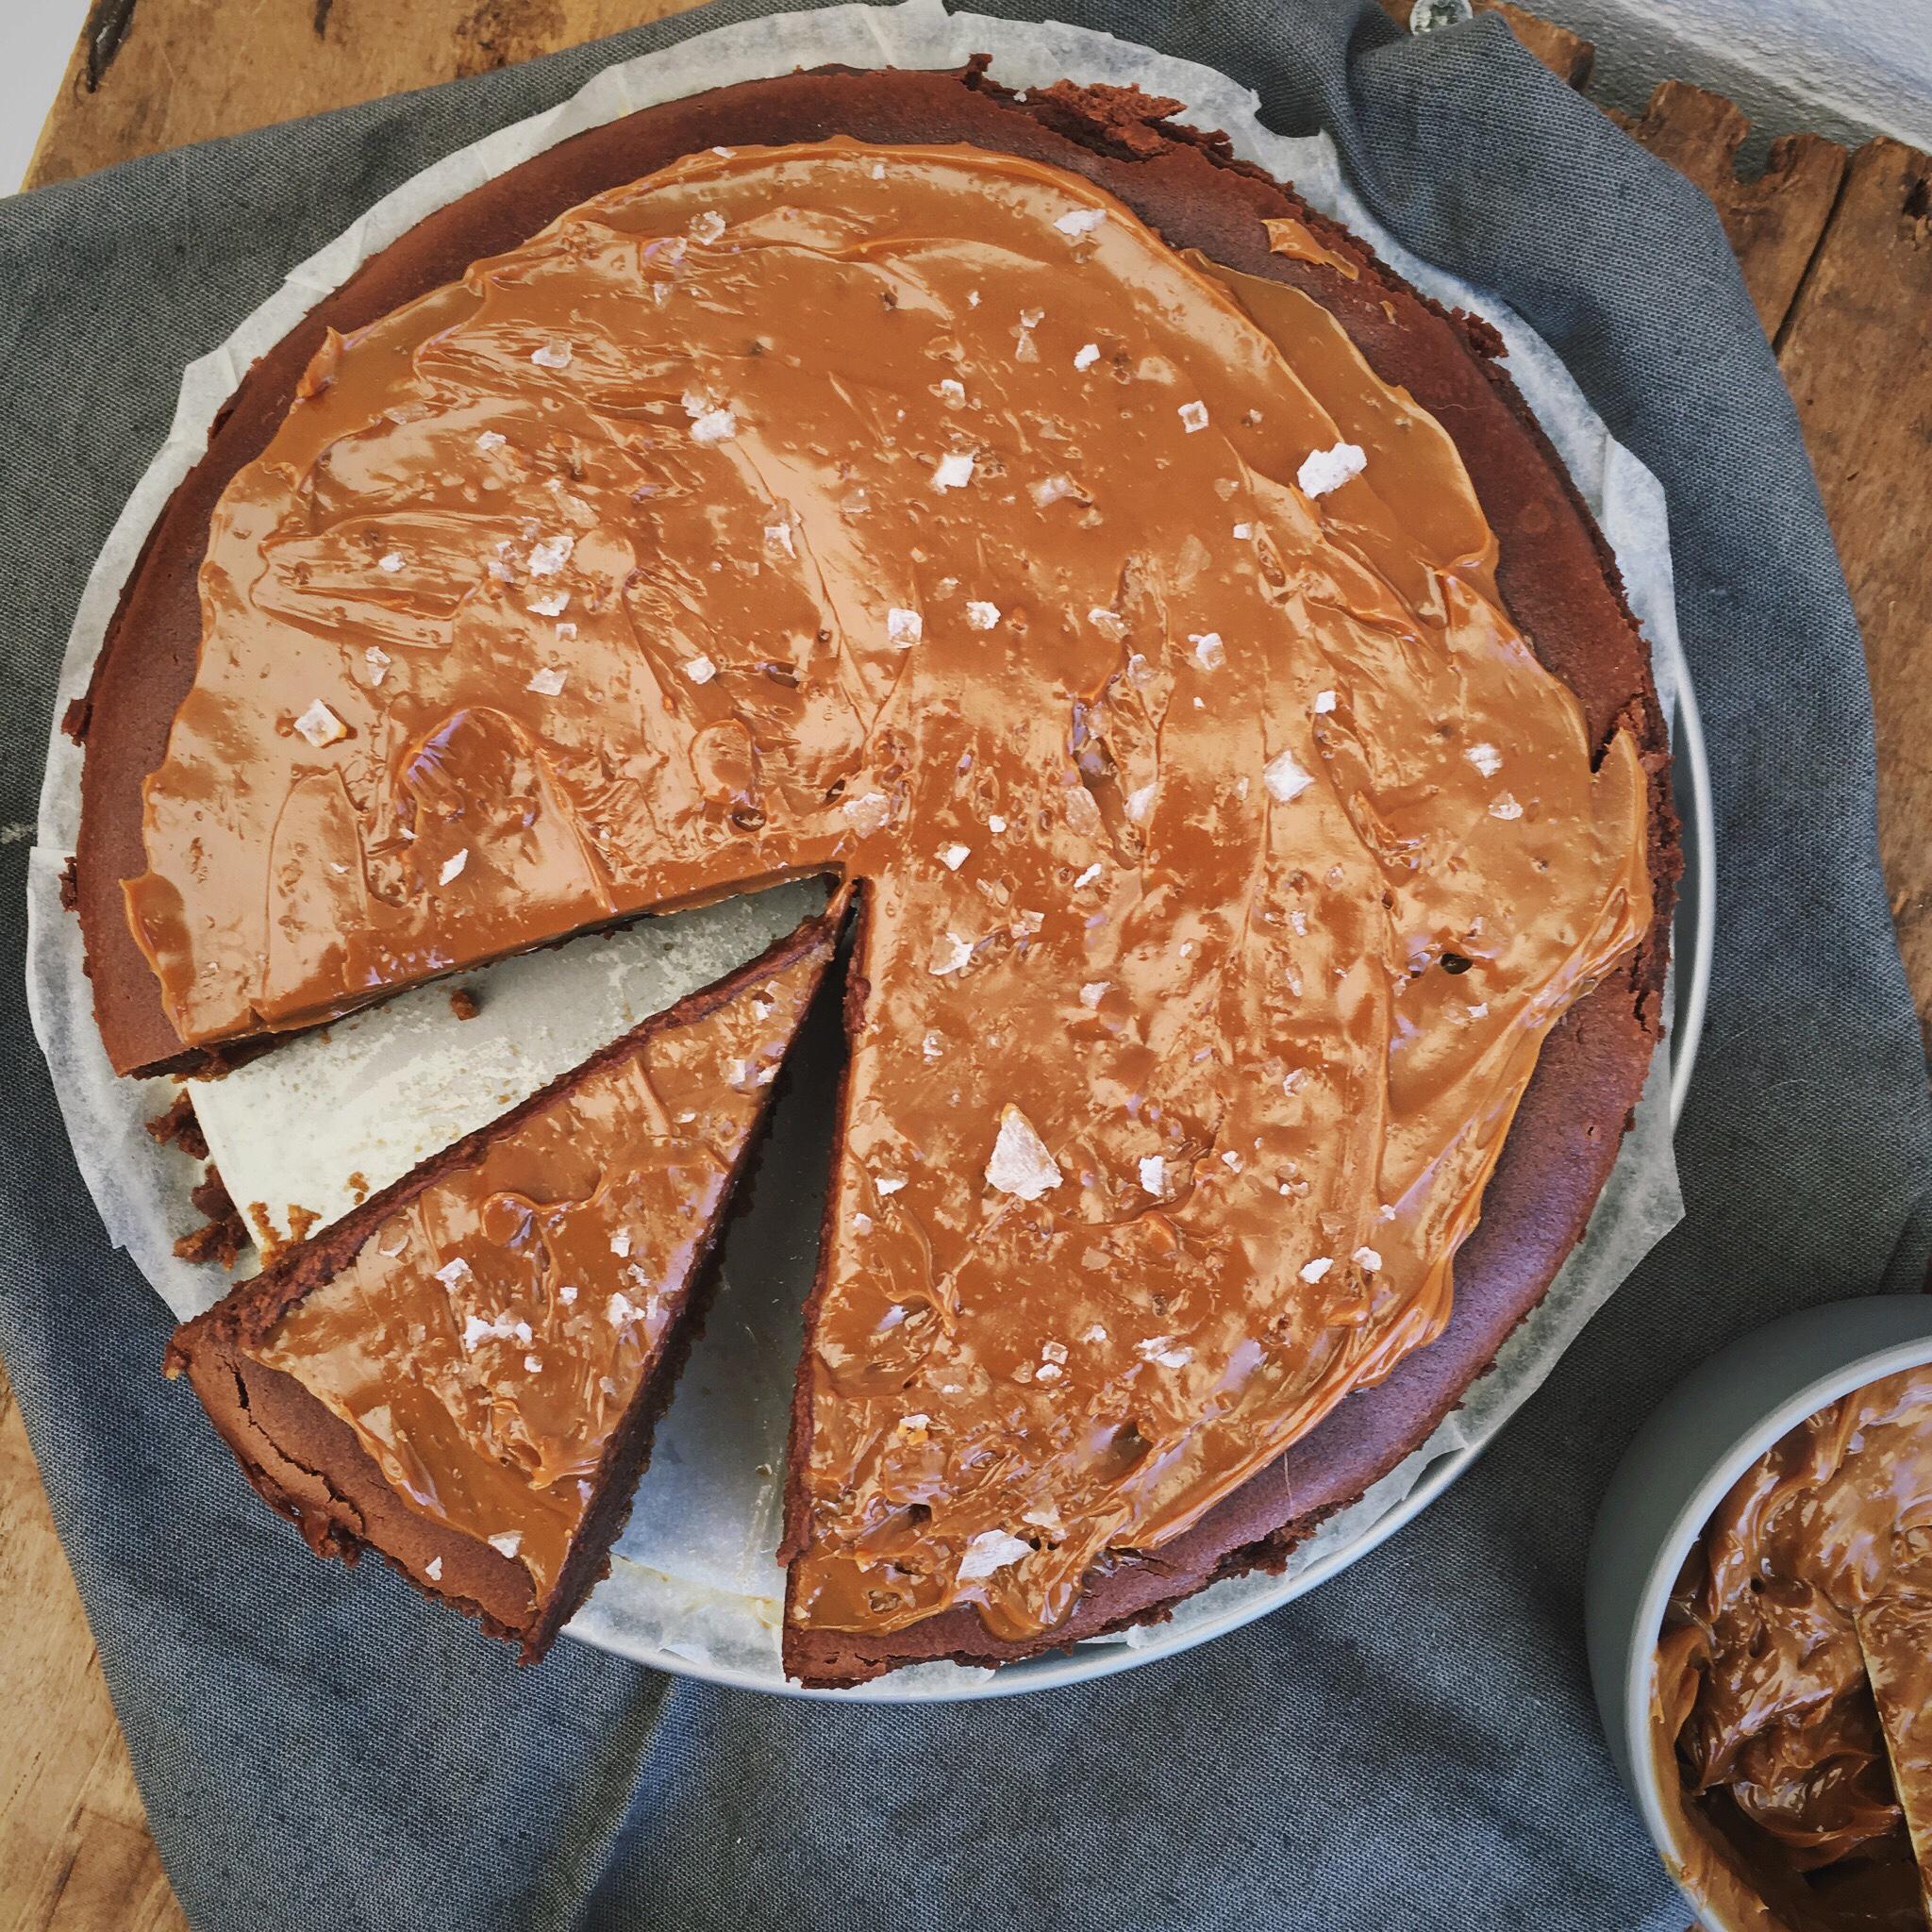 Chocolade cheesecake met gezouten karamel